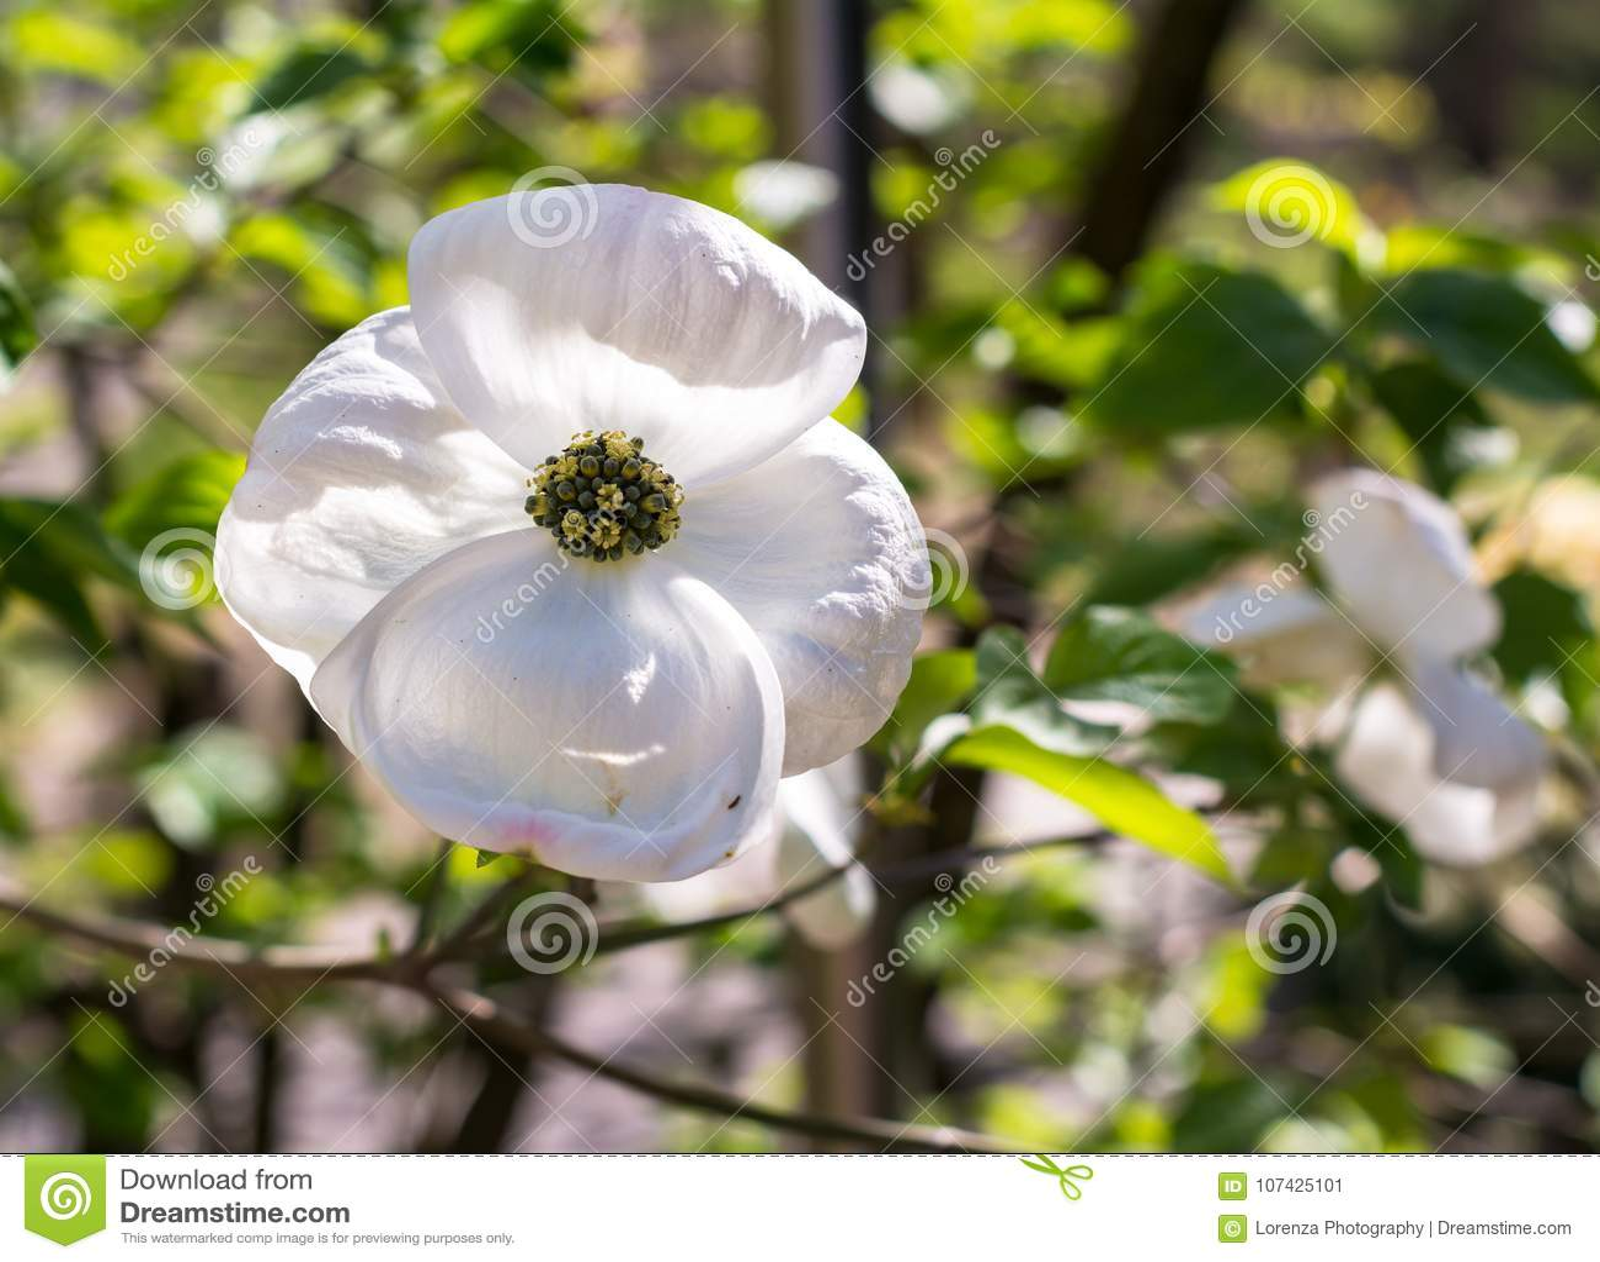 White Dogwood Cornus Florida In Spring Closeup Of Flower Stock